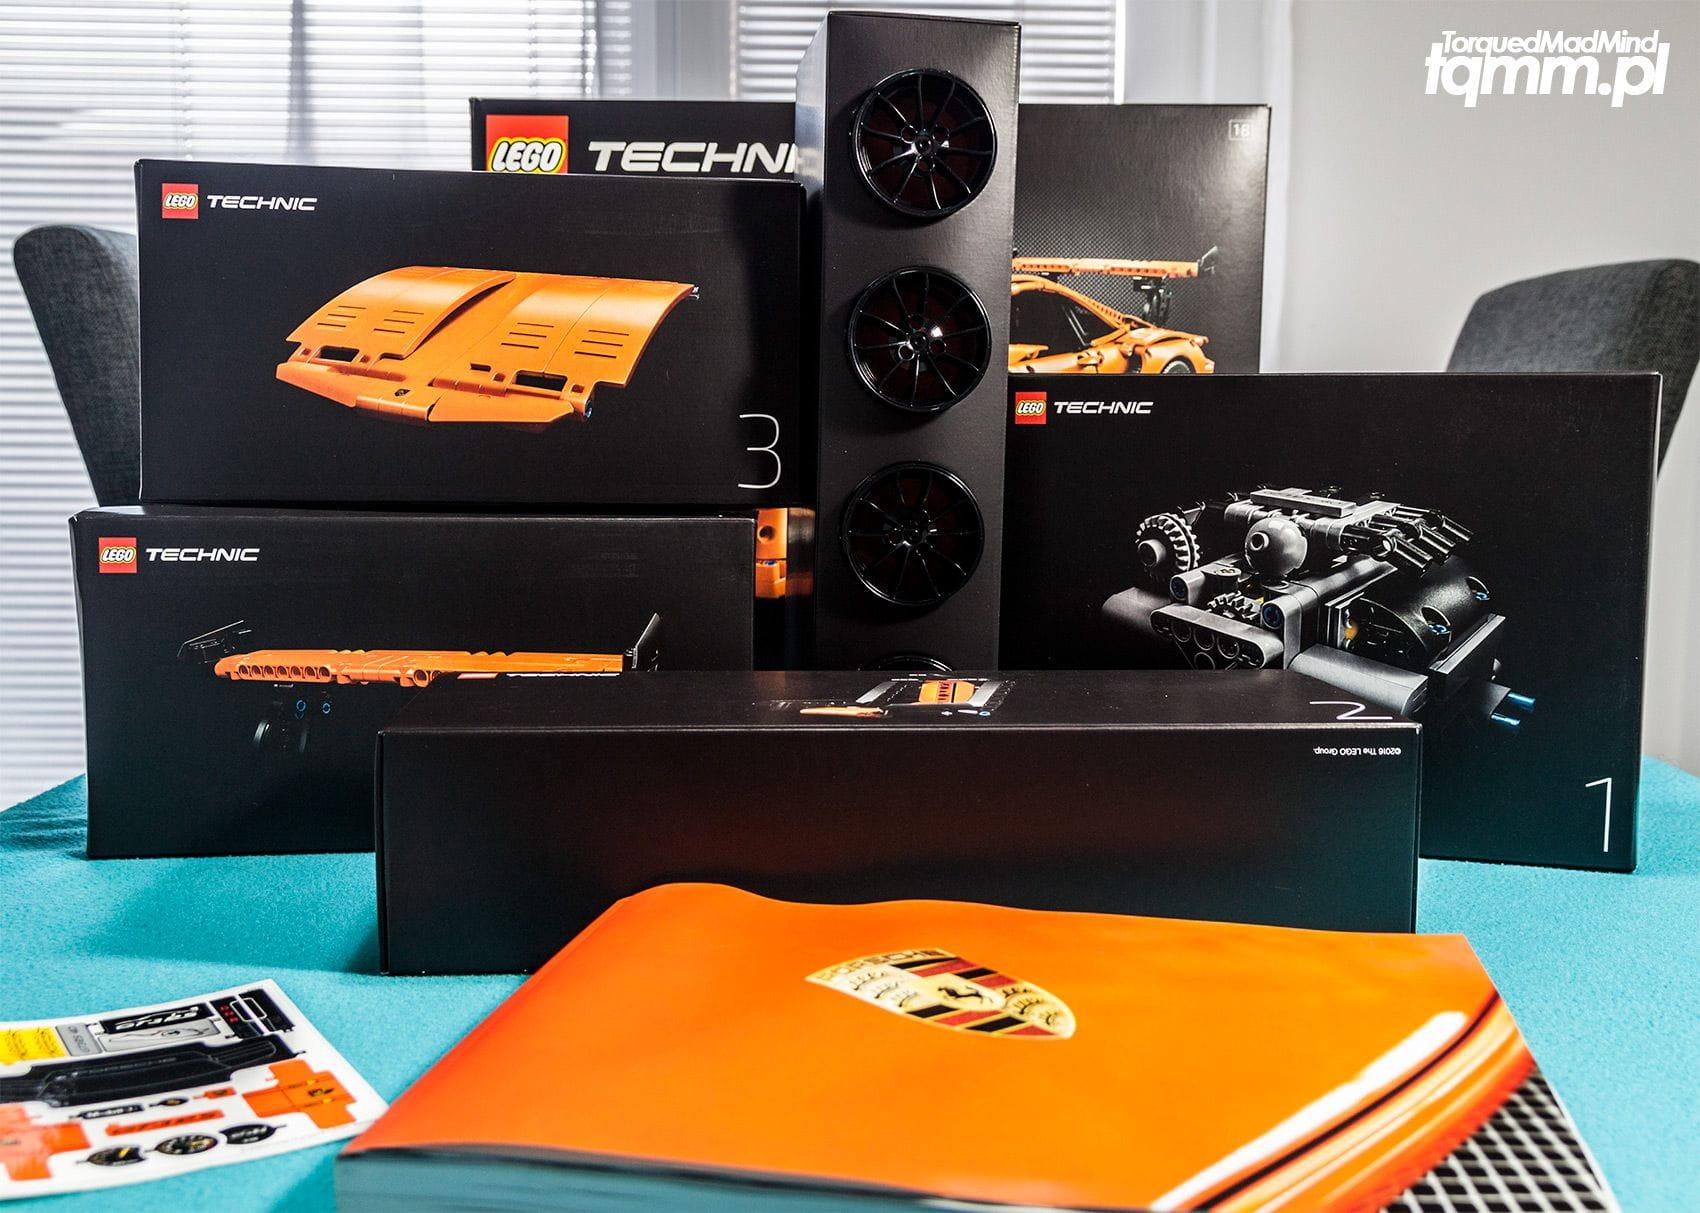 Fotki #105: Lego Technic Porsche 911 GT3 RS 42056